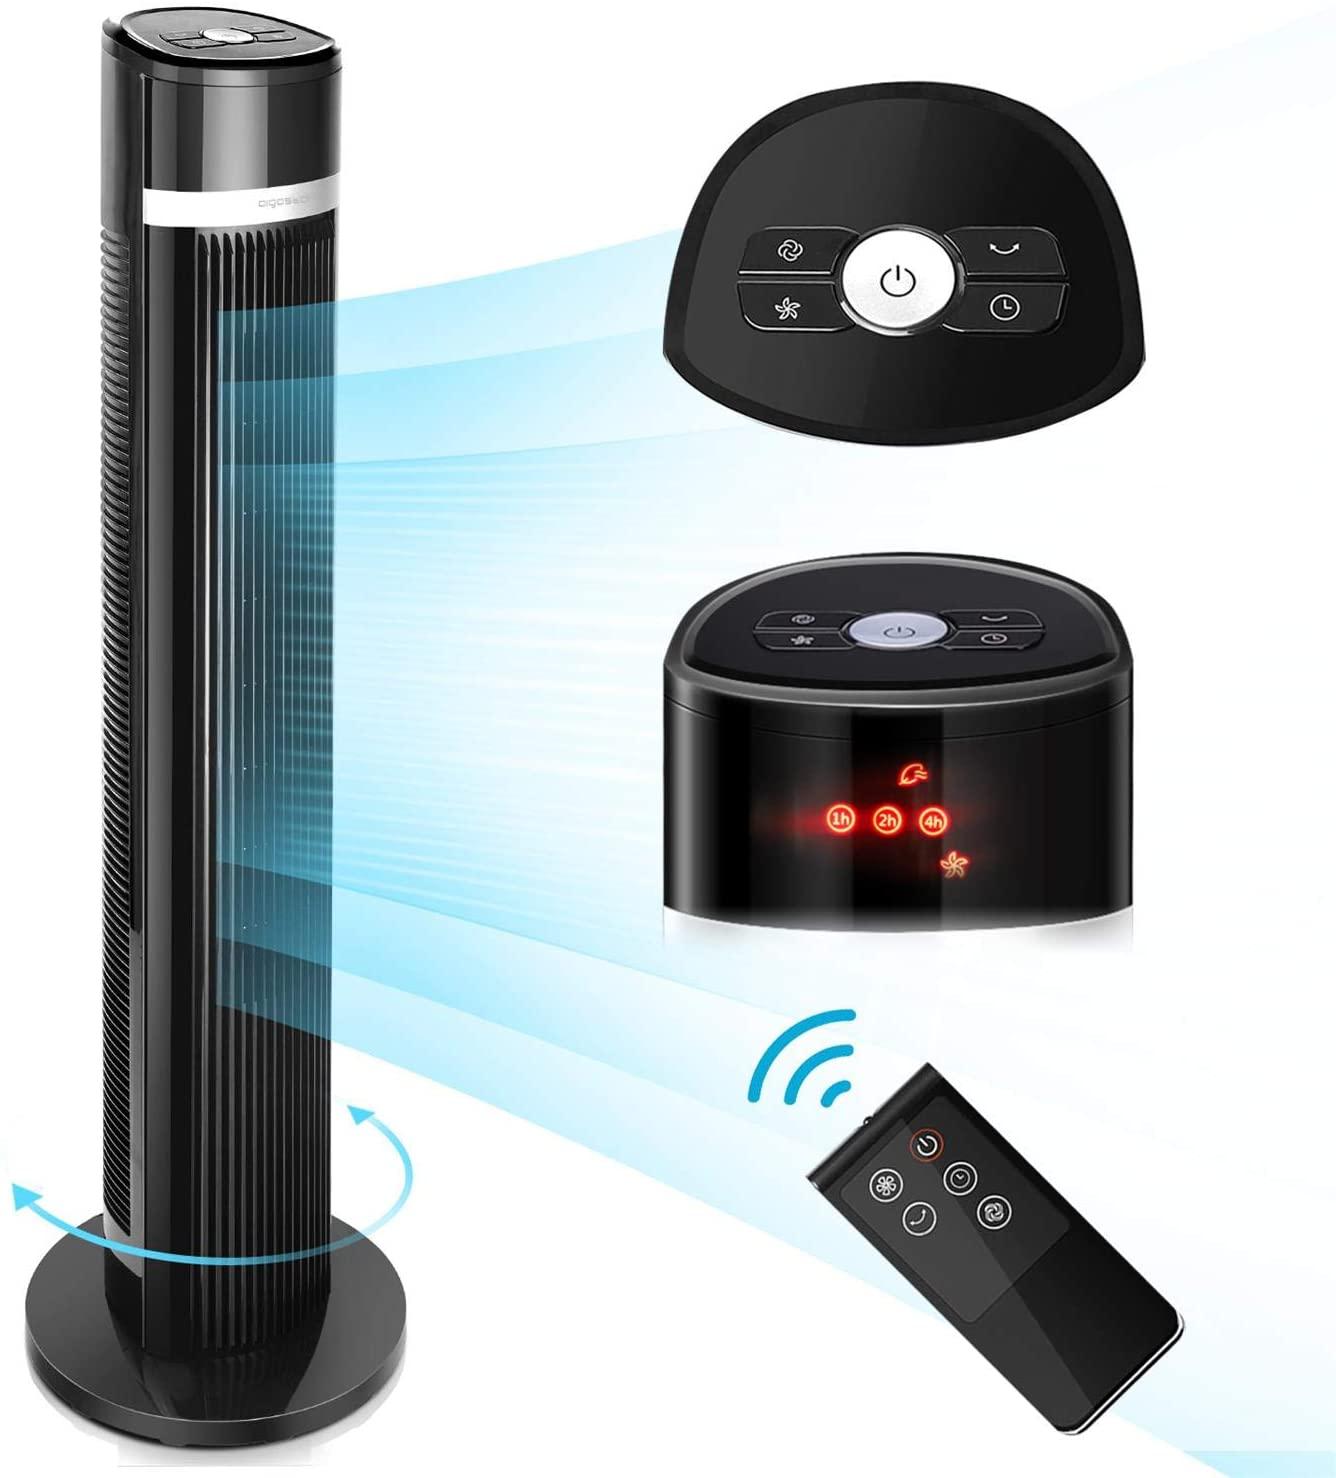 Aigostar Ross– Ventilador Torre Silencioso, Ventilador de Torre con Mando, 103cm Ventilador con 3 Velocidades y 3 Modos, 35W, Oscilación de 60°, Temporizador 7H, Pantalla LED,Negro